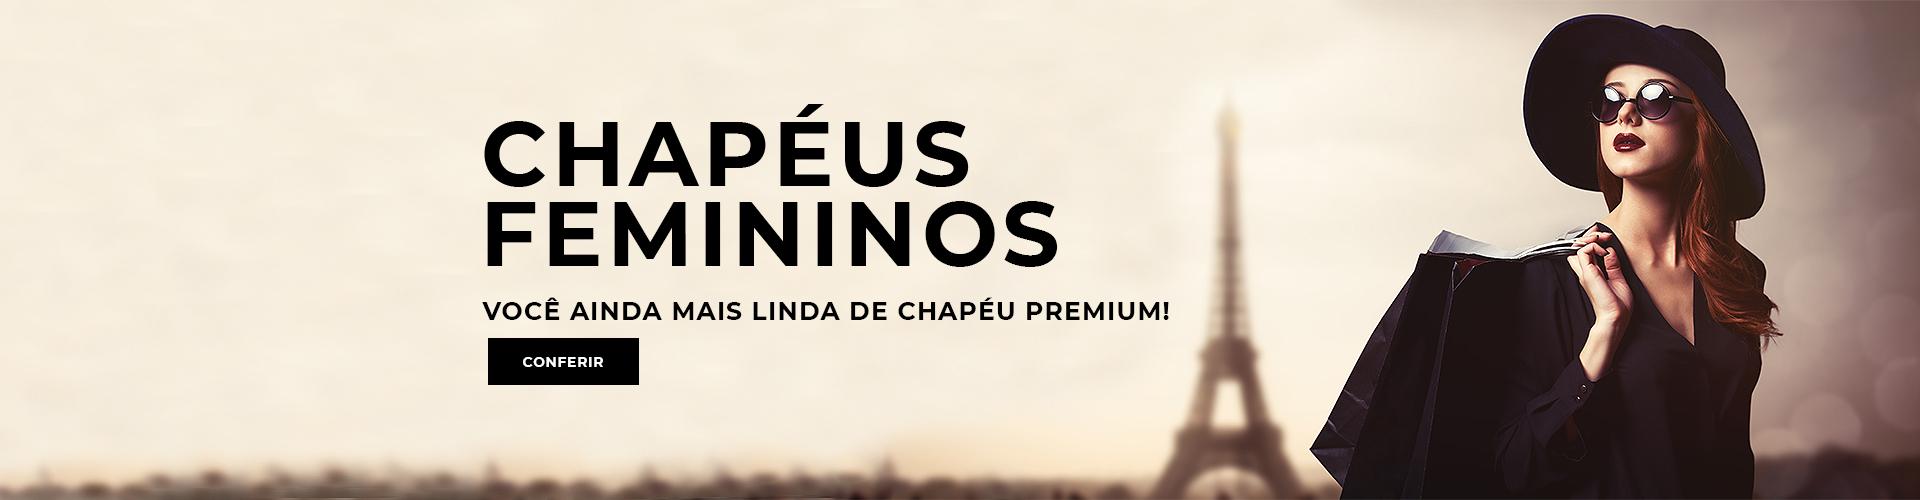 Chapéus Femininos www.chapeupremium.com.br